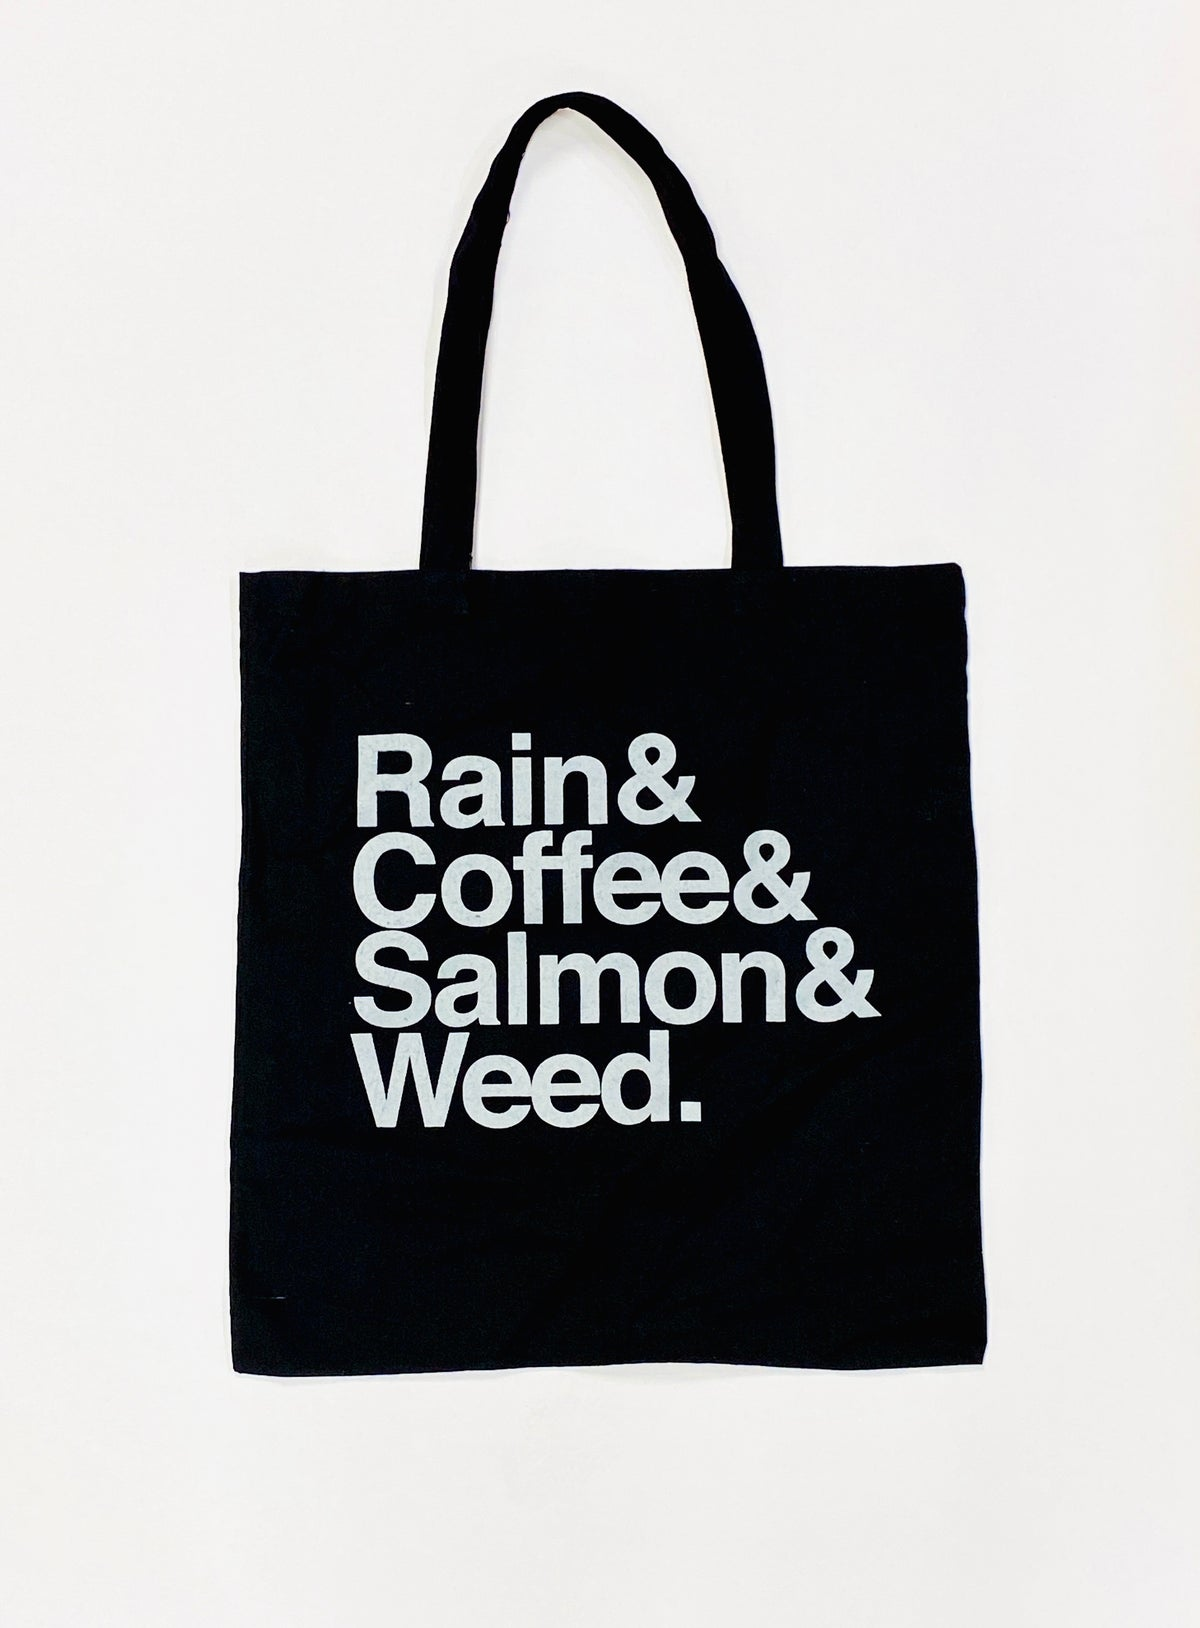 Rain&Coffee&Salmon&Weed Tote Bag